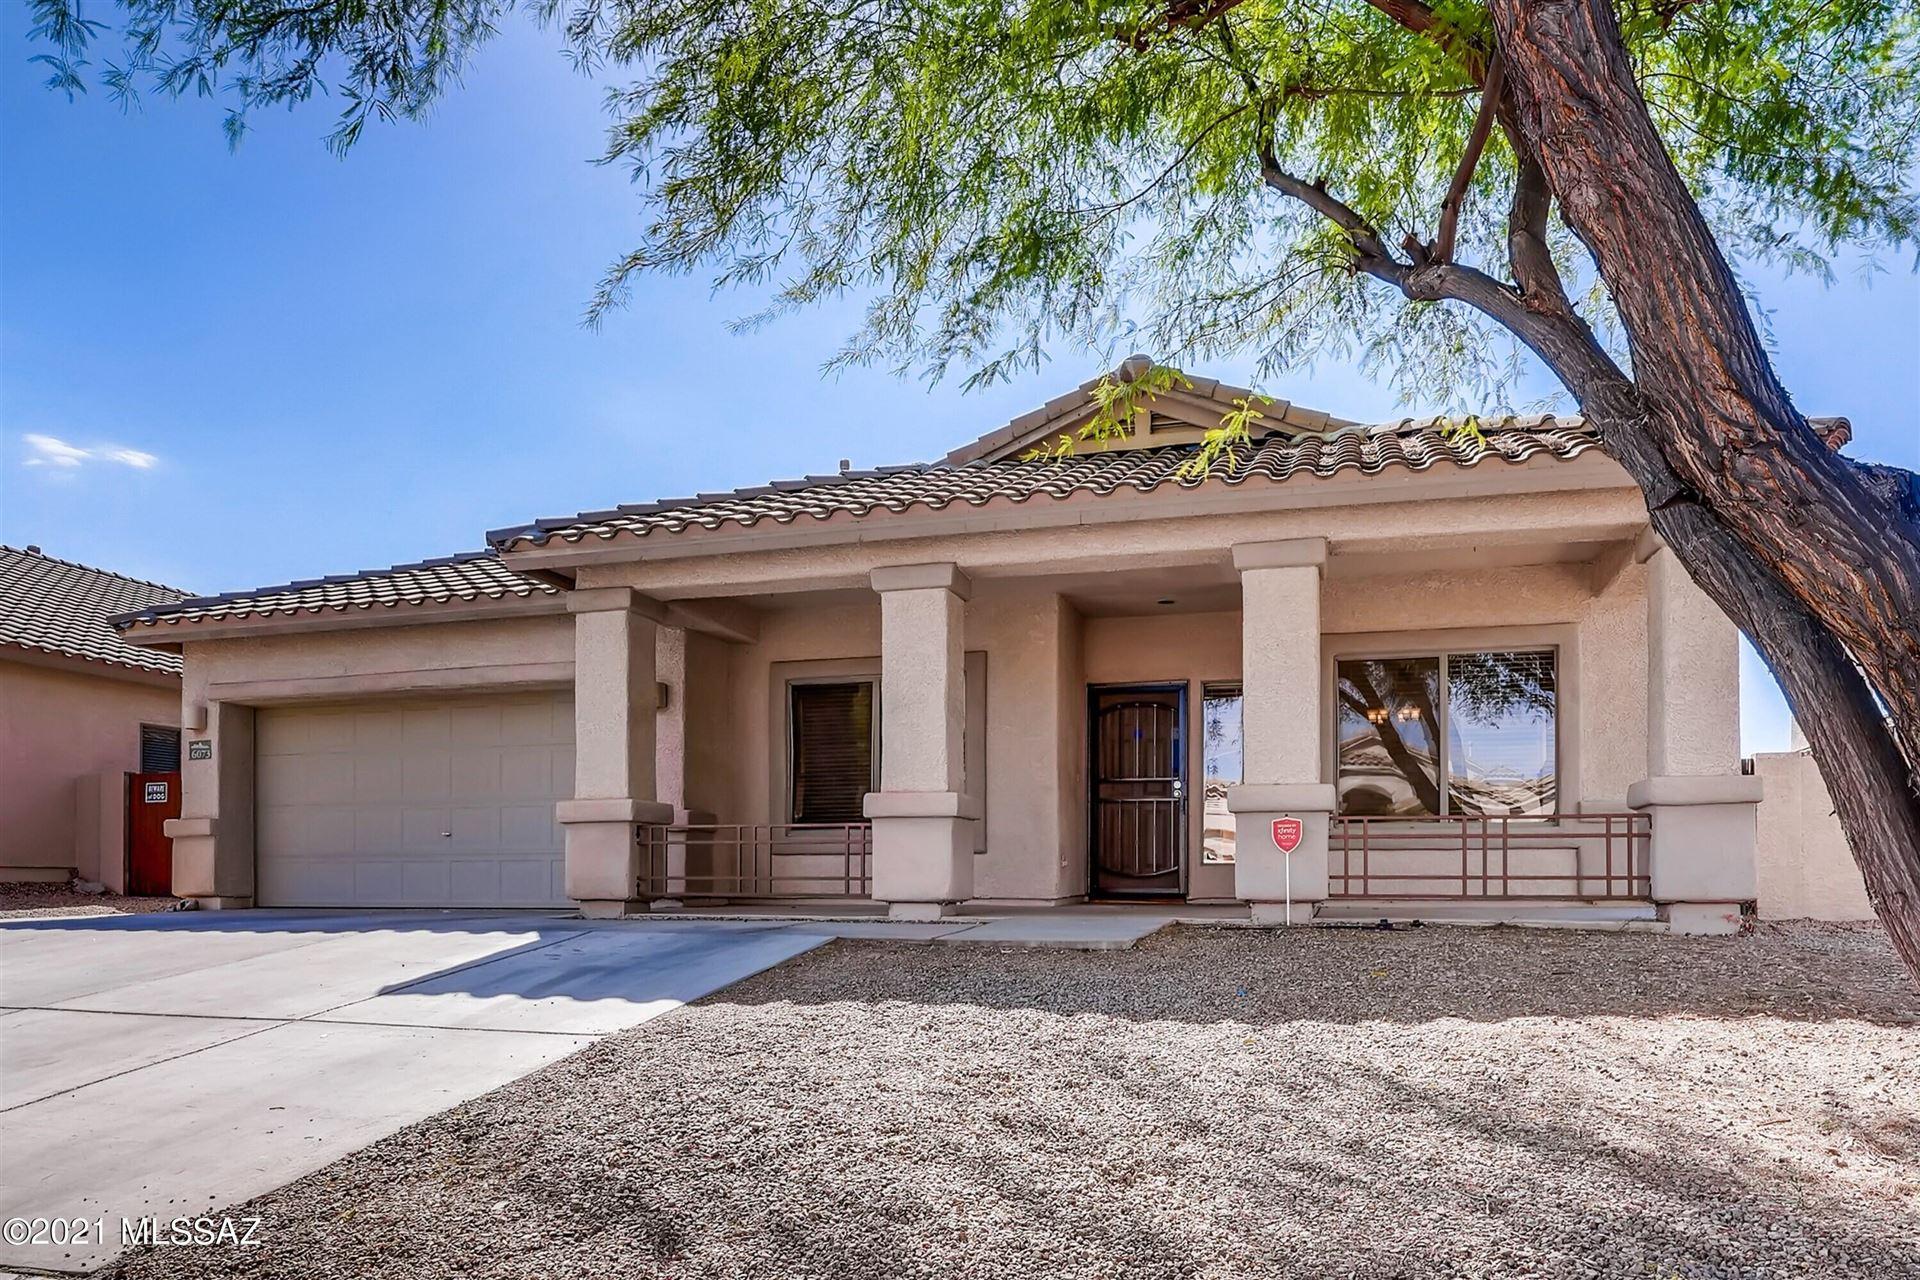 6073 W Millay Street, Tucson, AZ 85743 - MLS#: 22114603